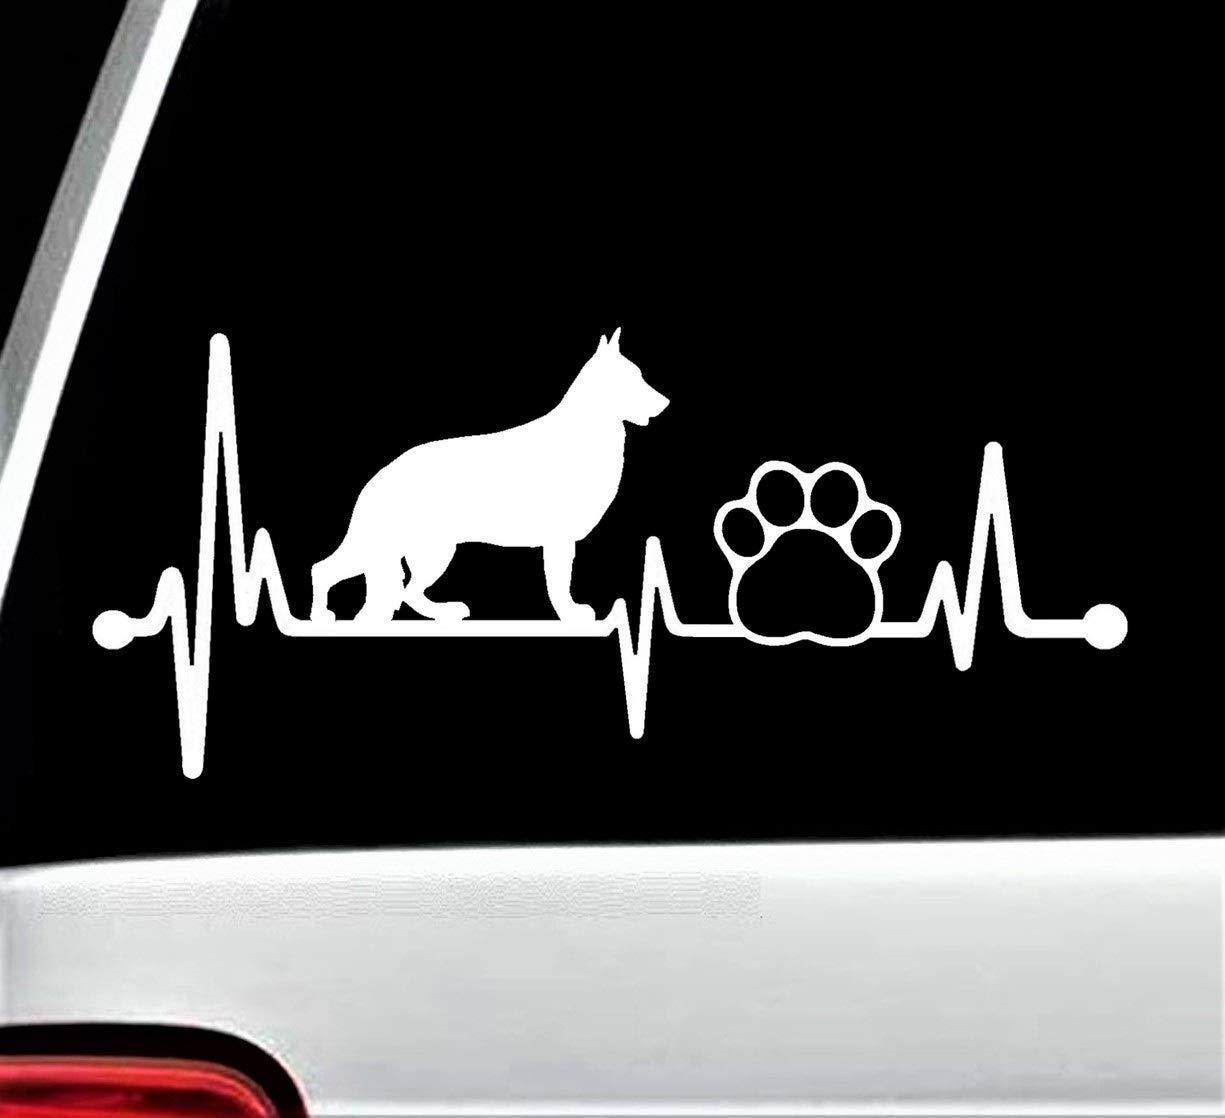 German shepherd pet paw heartbeat lifeline dog decal sticker for car window 8 inch bg 139 amazon ca handmade